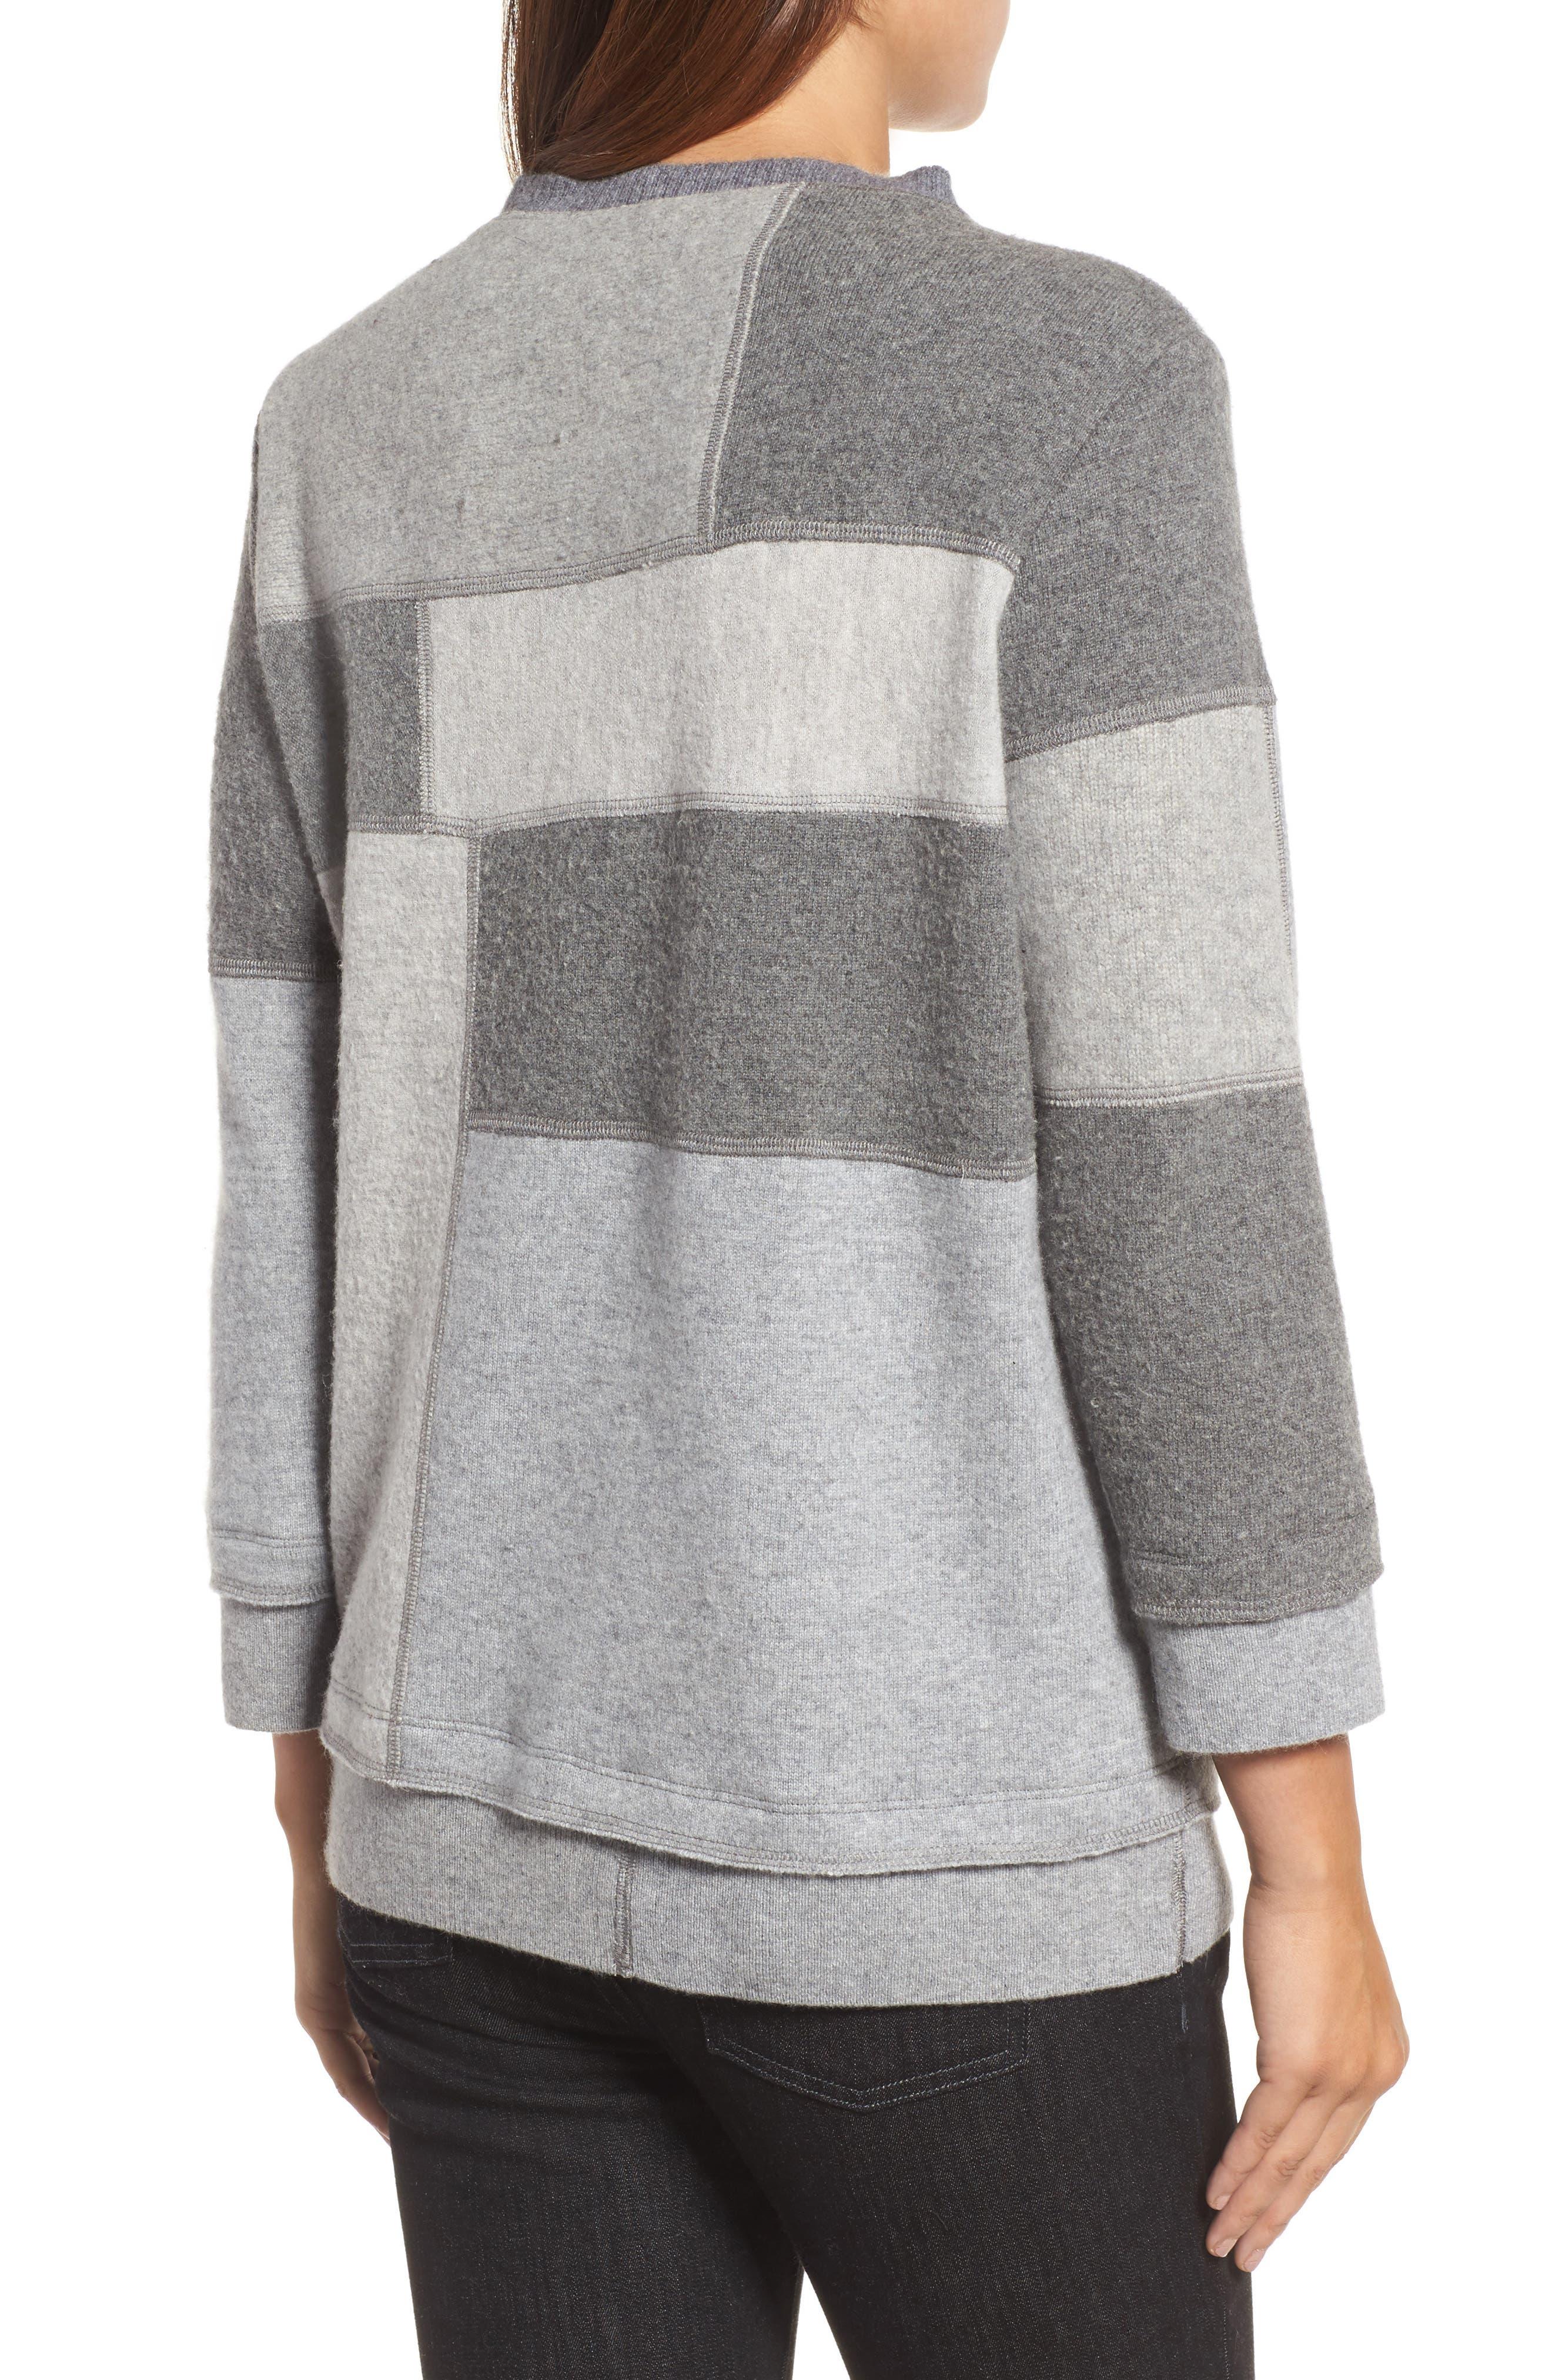 Colorblock Cashmere Sweater,                             Alternate thumbnail 2, color,                             Grey